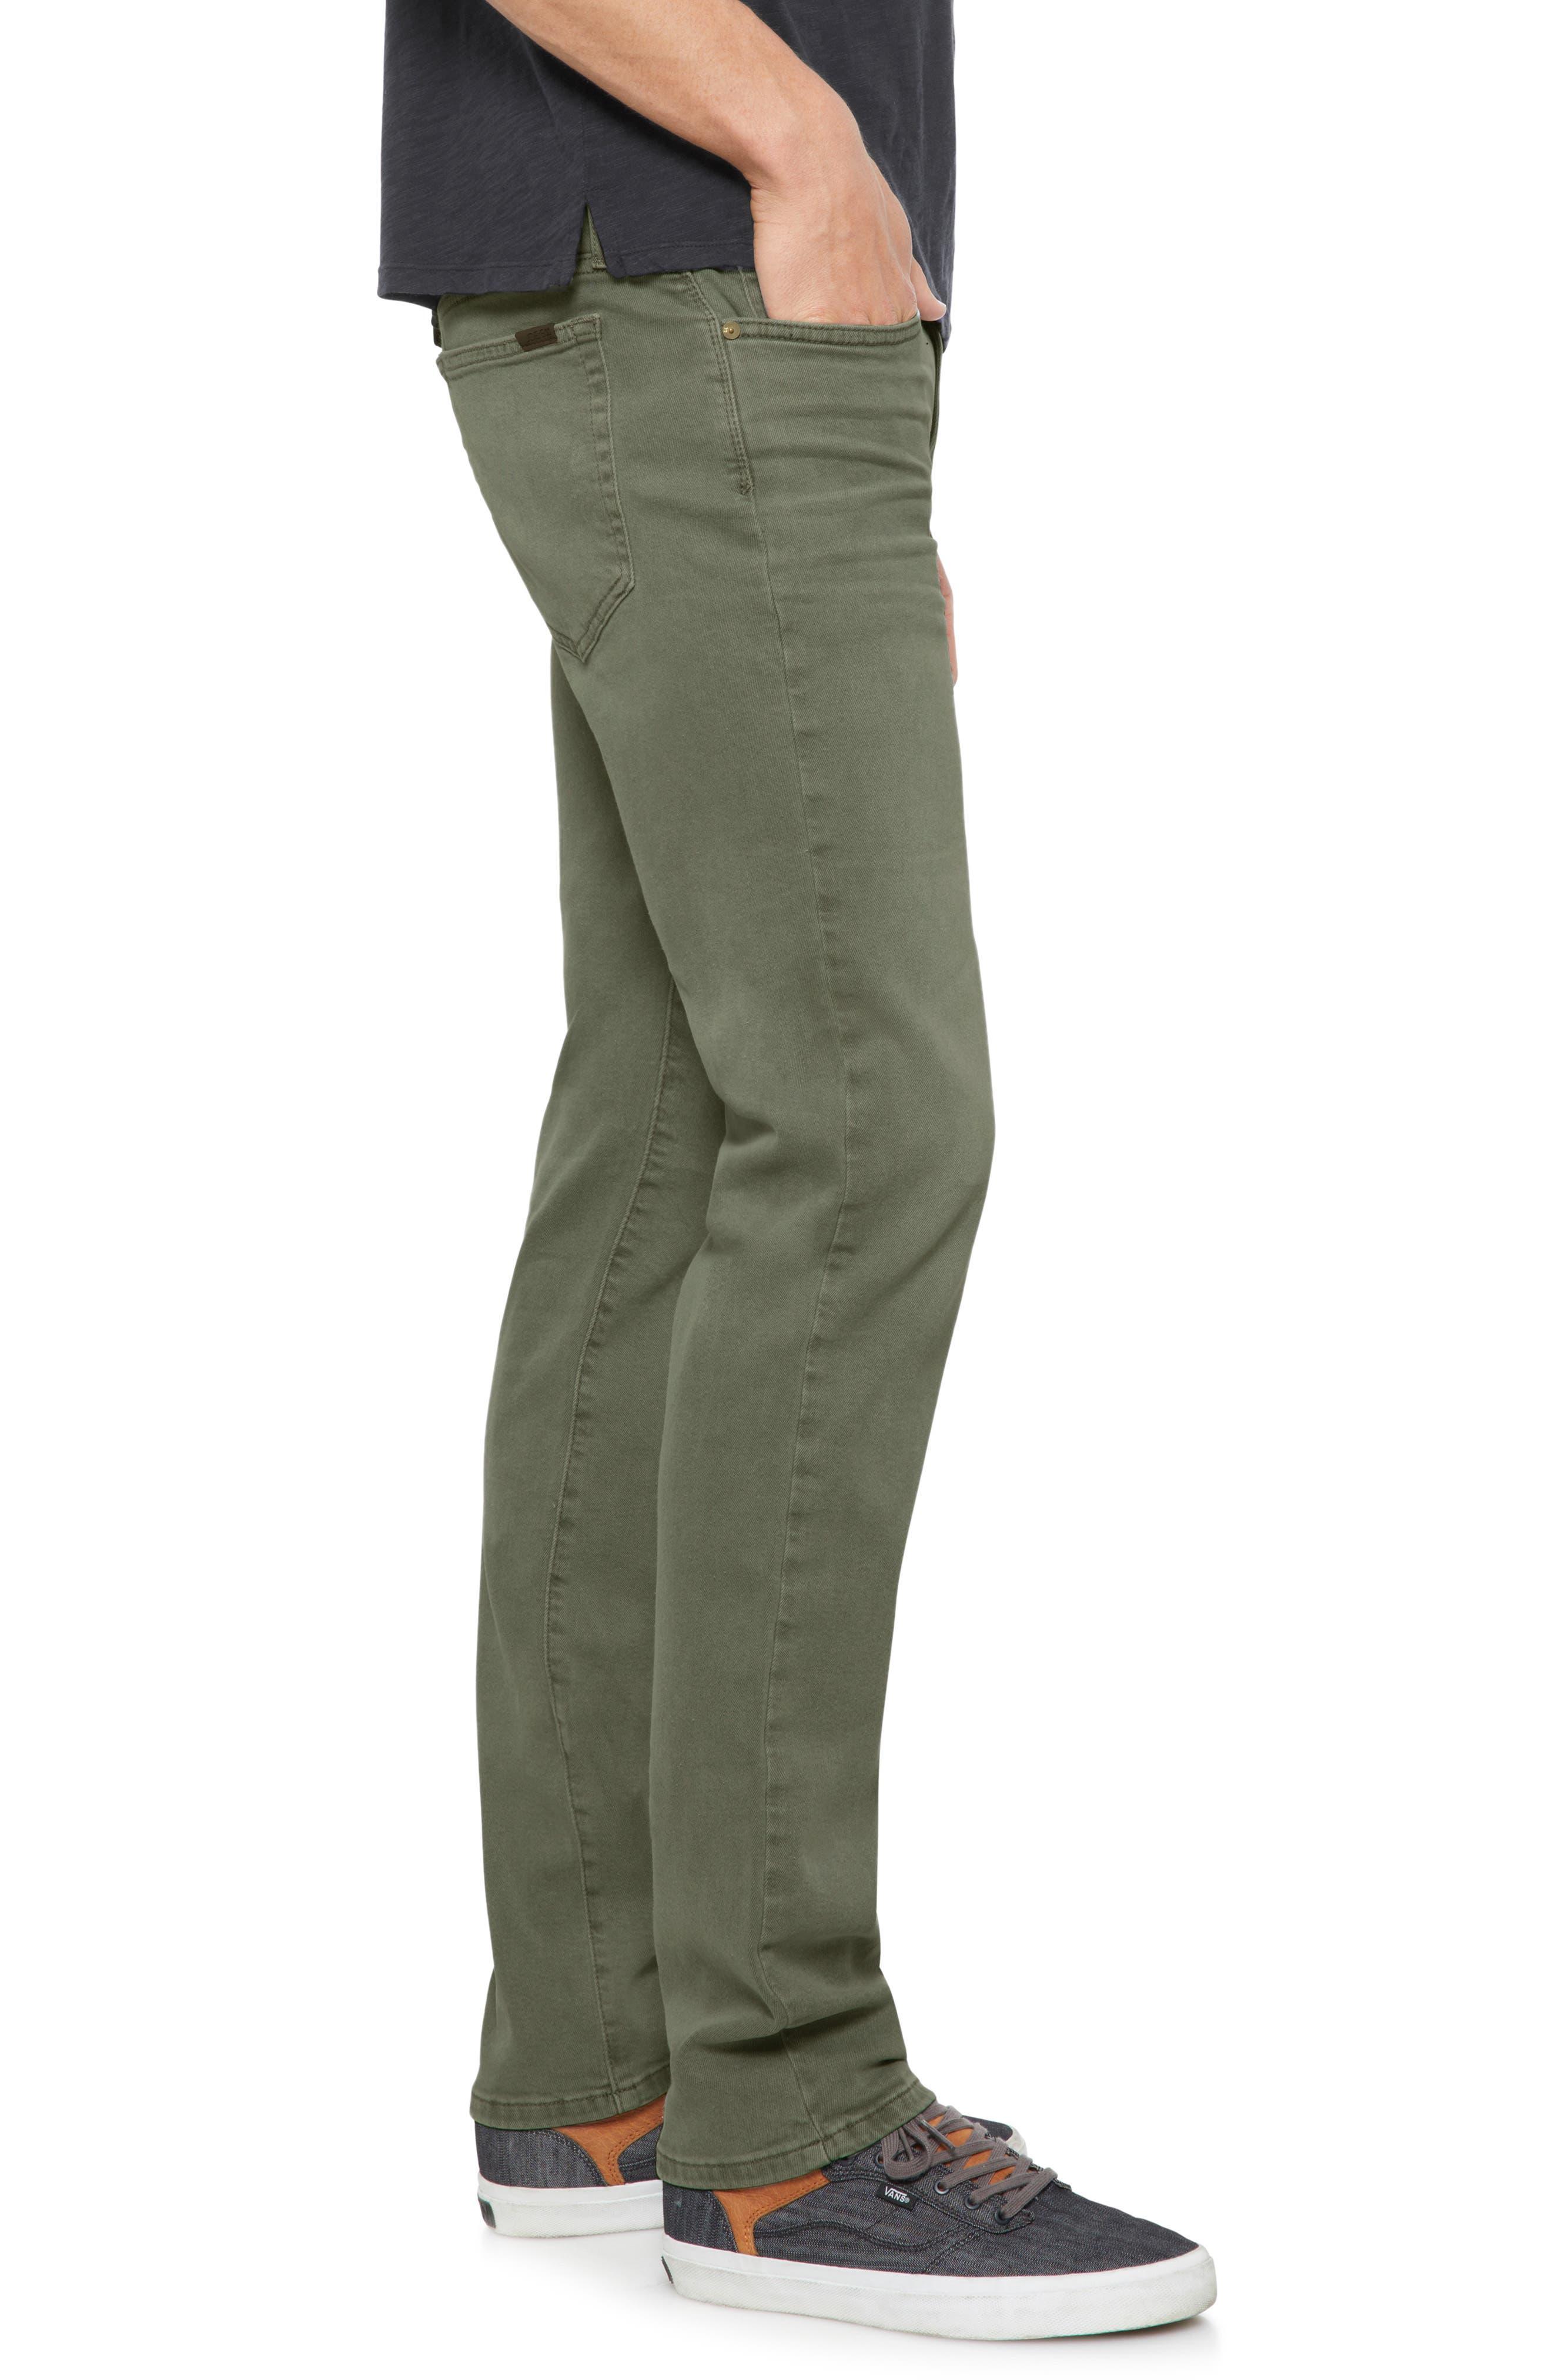 Brixton Slim Straight Leg Jeans,                             Alternate thumbnail 3, color,                             Olive Tree